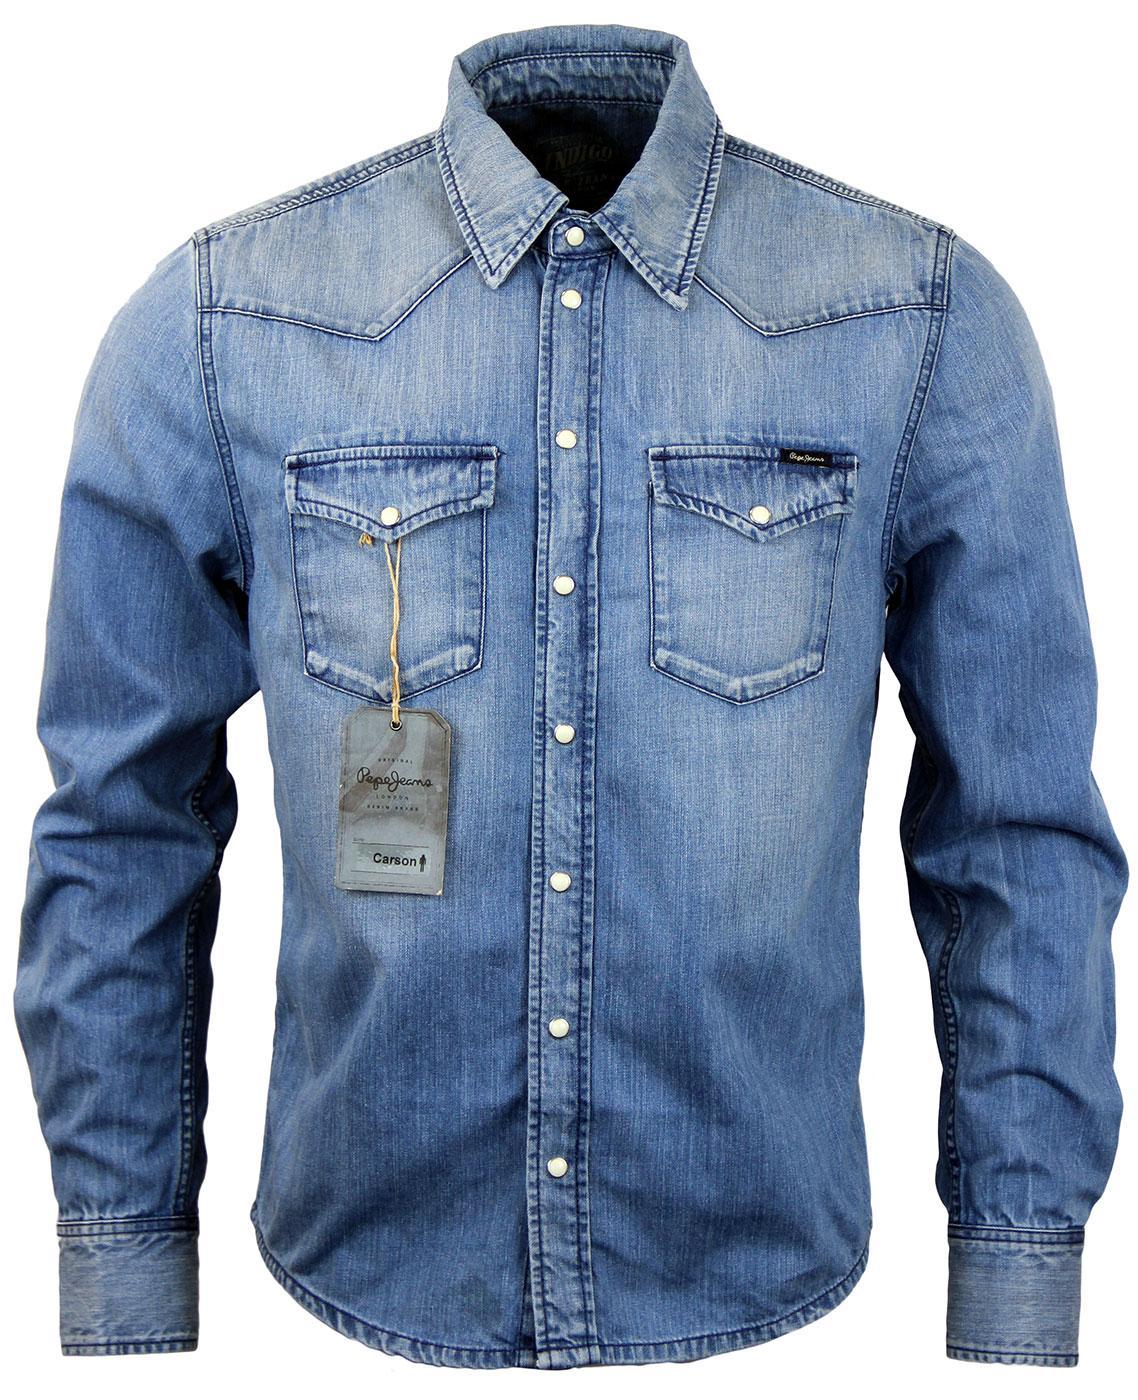 Carson pepe jeans retro 70s light wash denim over shirt for Ladies light denim shirt